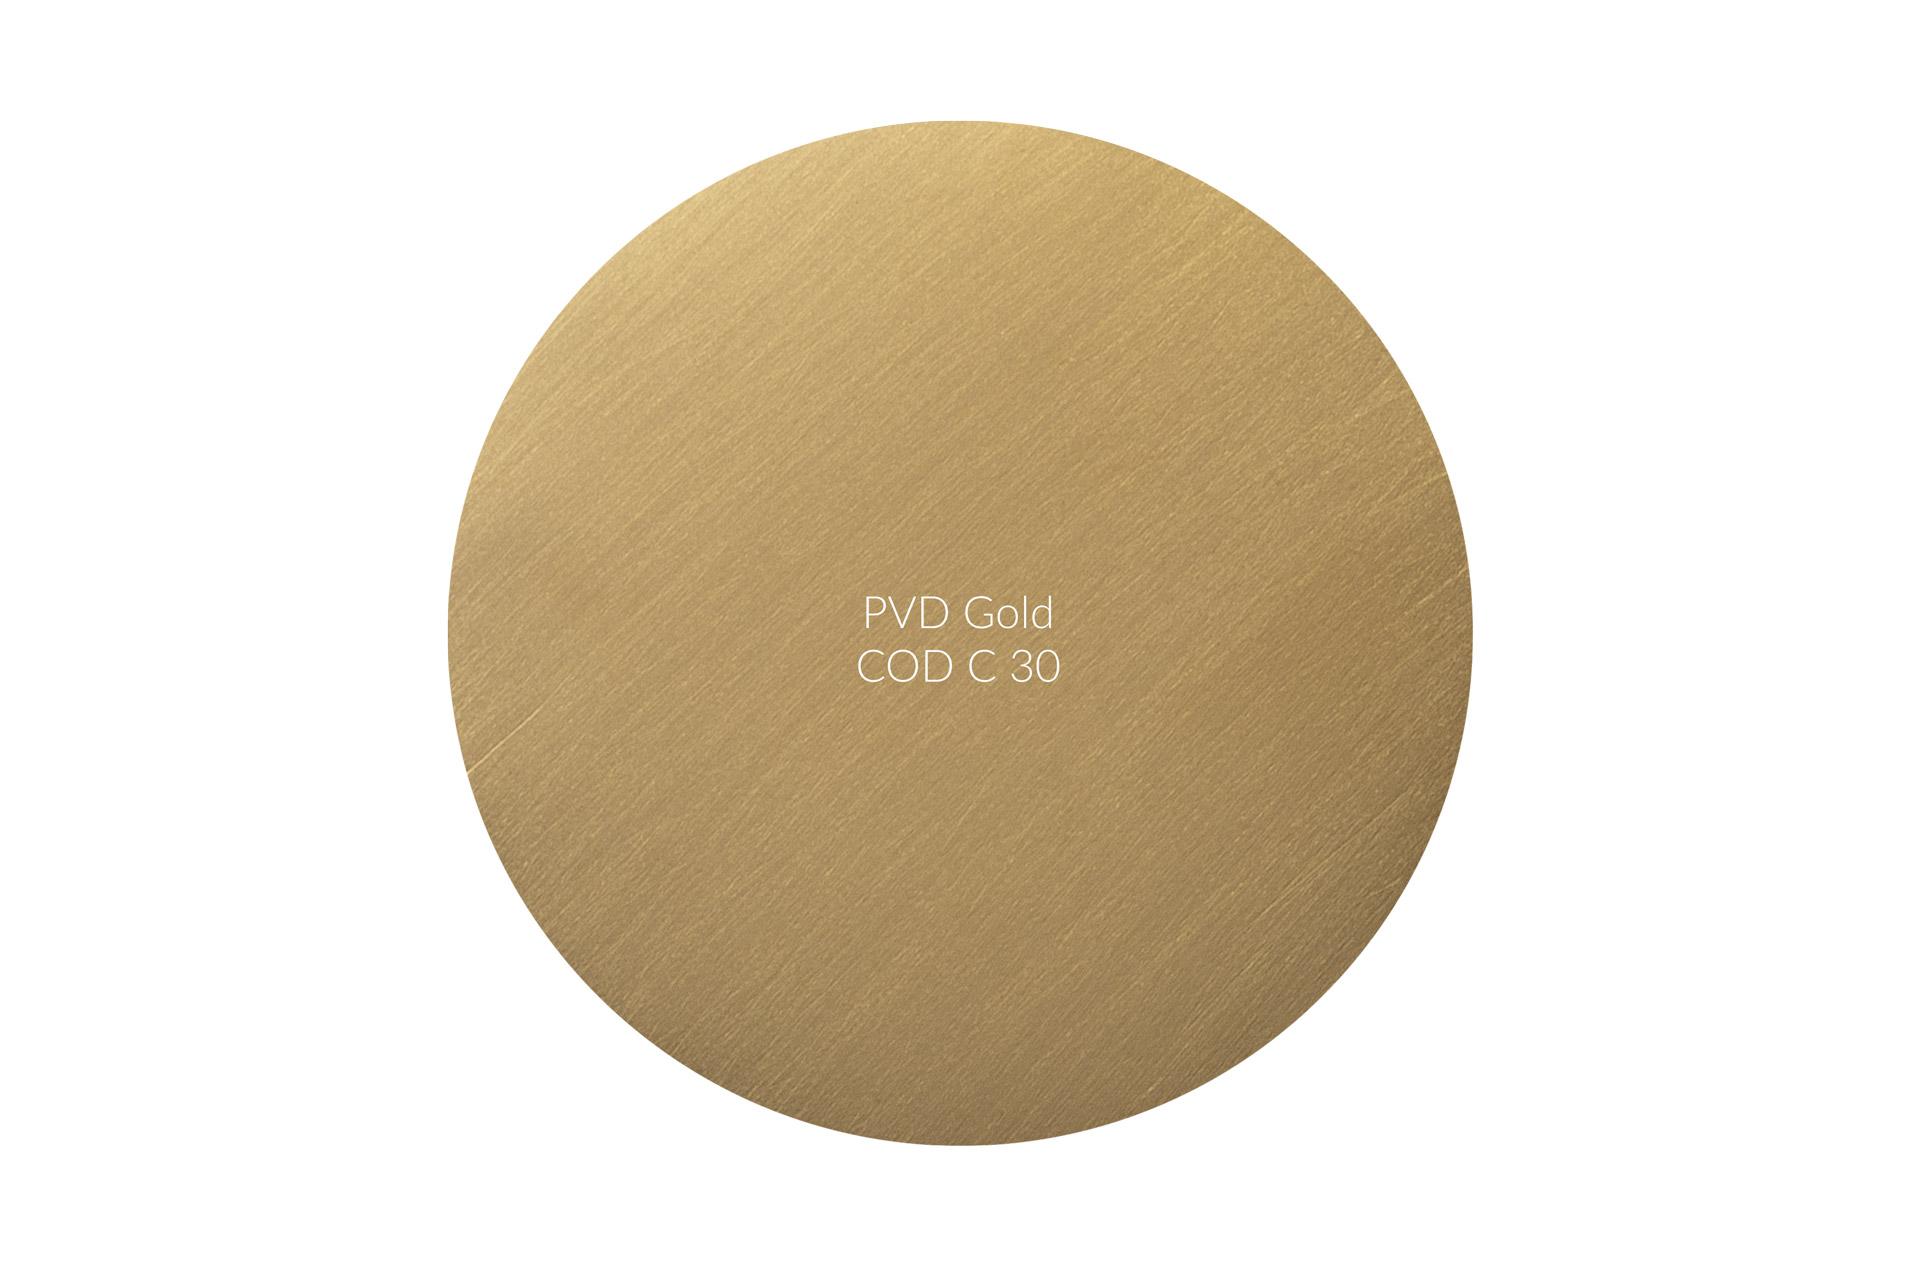 finitura-pvd-gold-c-30-2020